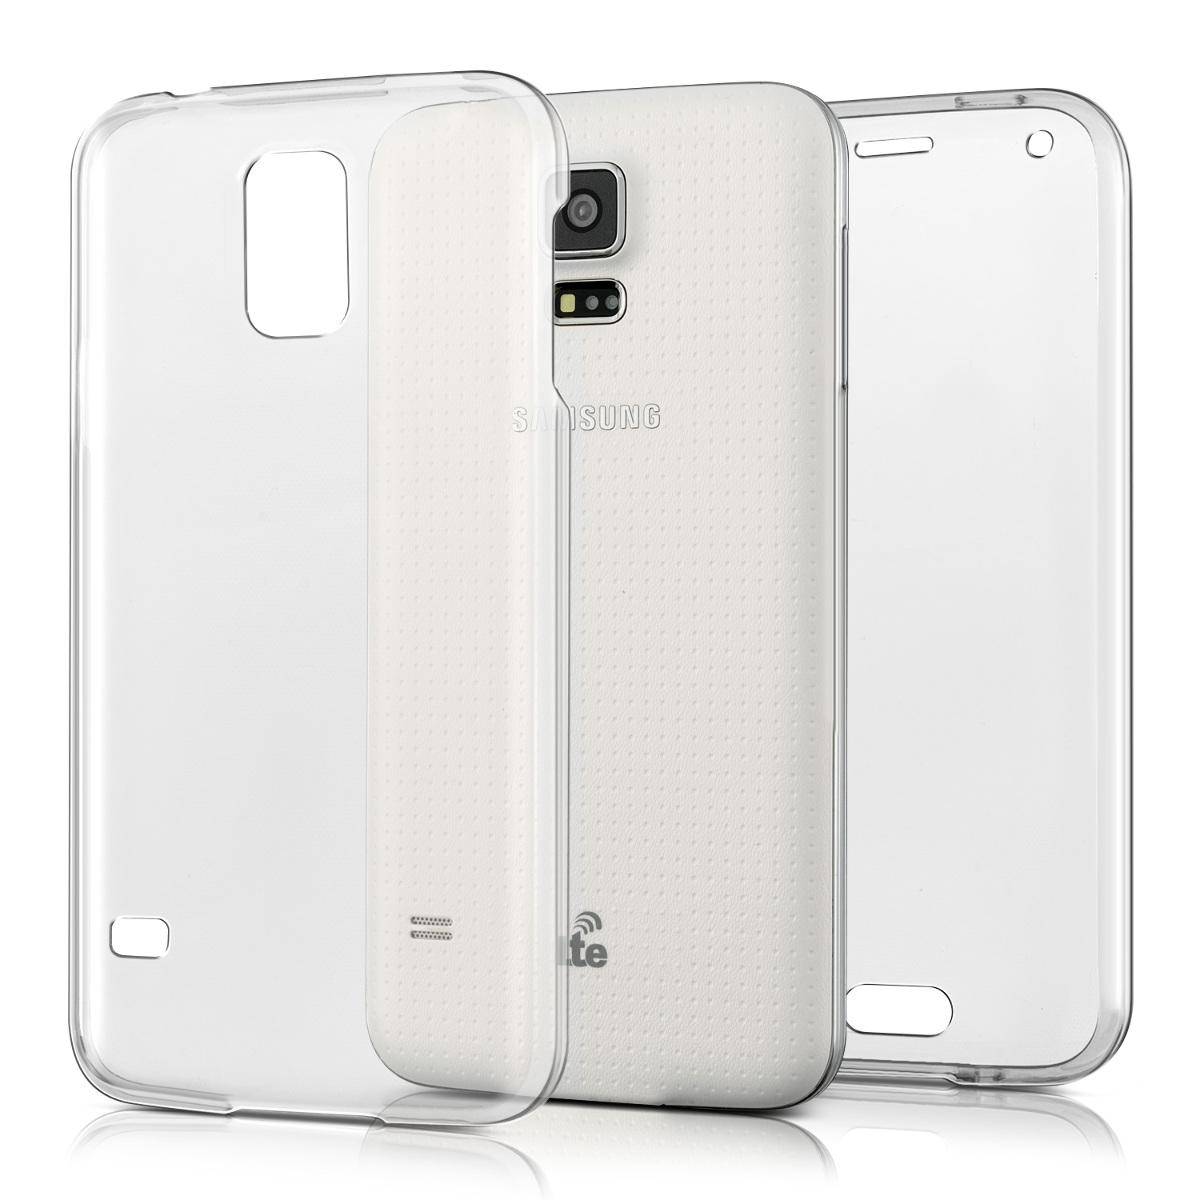 KW Διάφανη Θήκη Σιλικόνης Full Body Samsung Galaxy S5 / S5 Neo (37820.03)